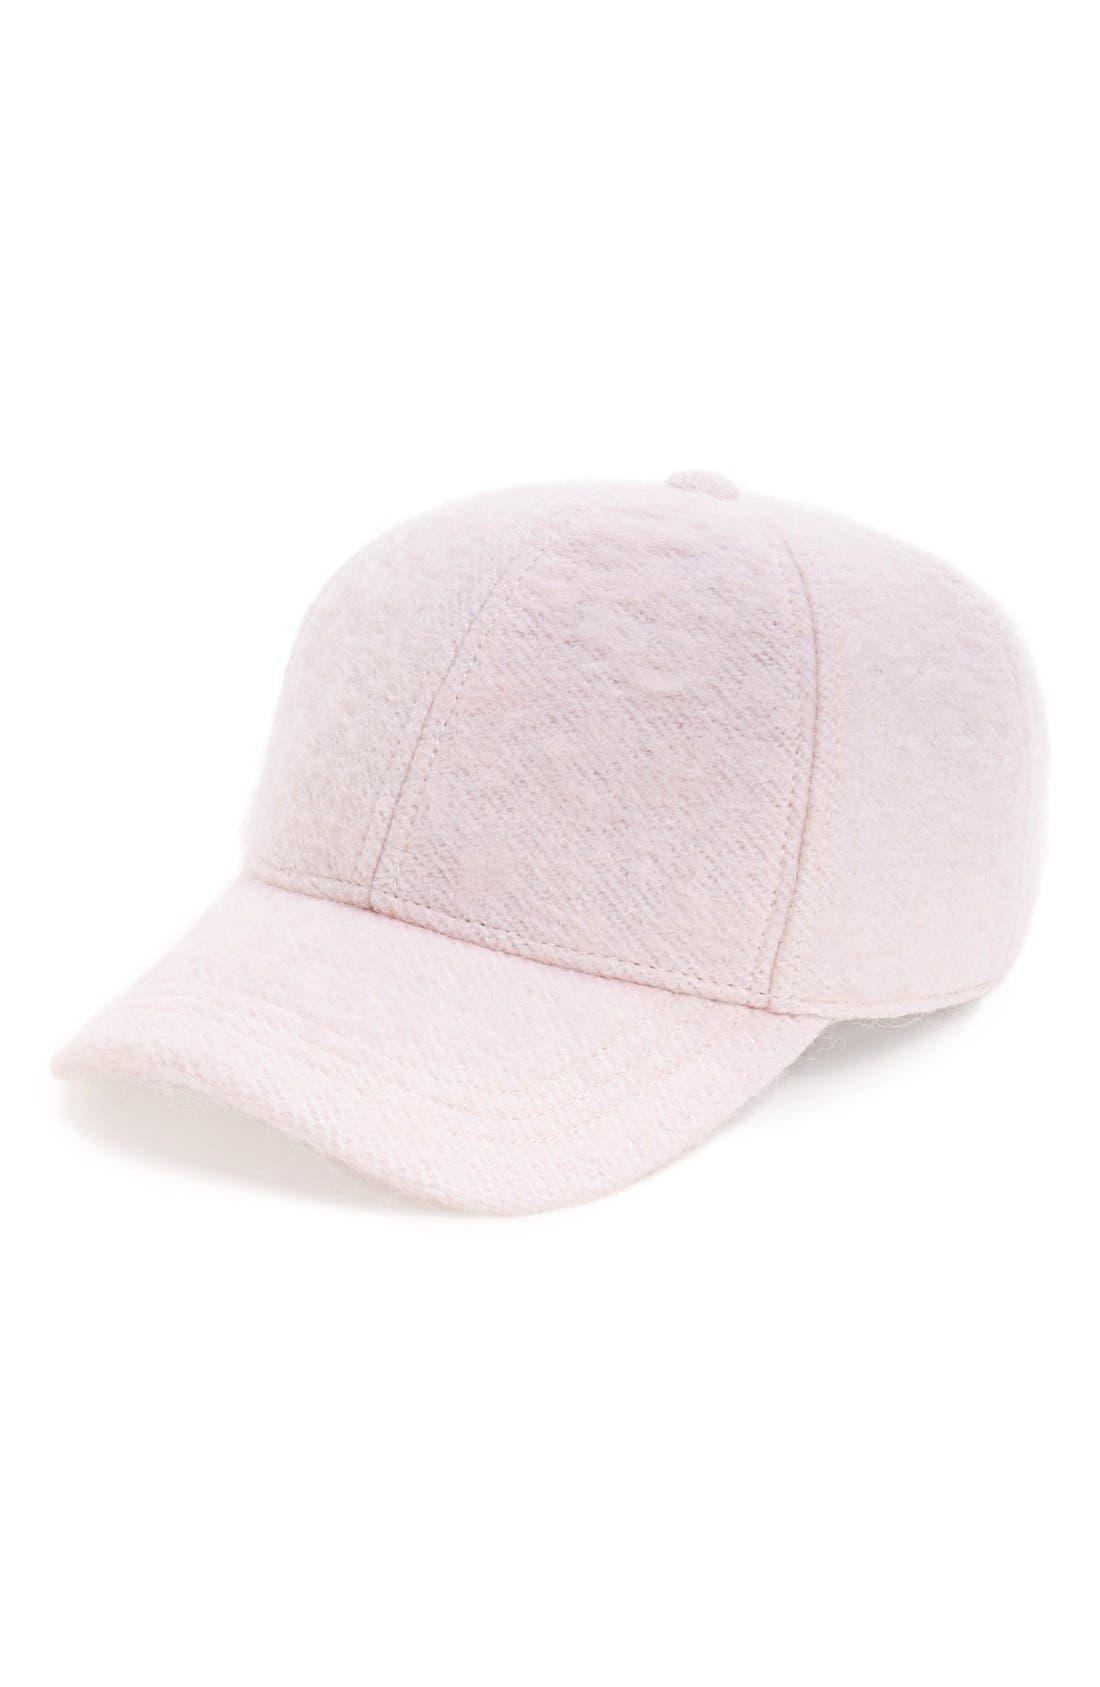 Main Image - BP. Wool Blend Baseball Cap